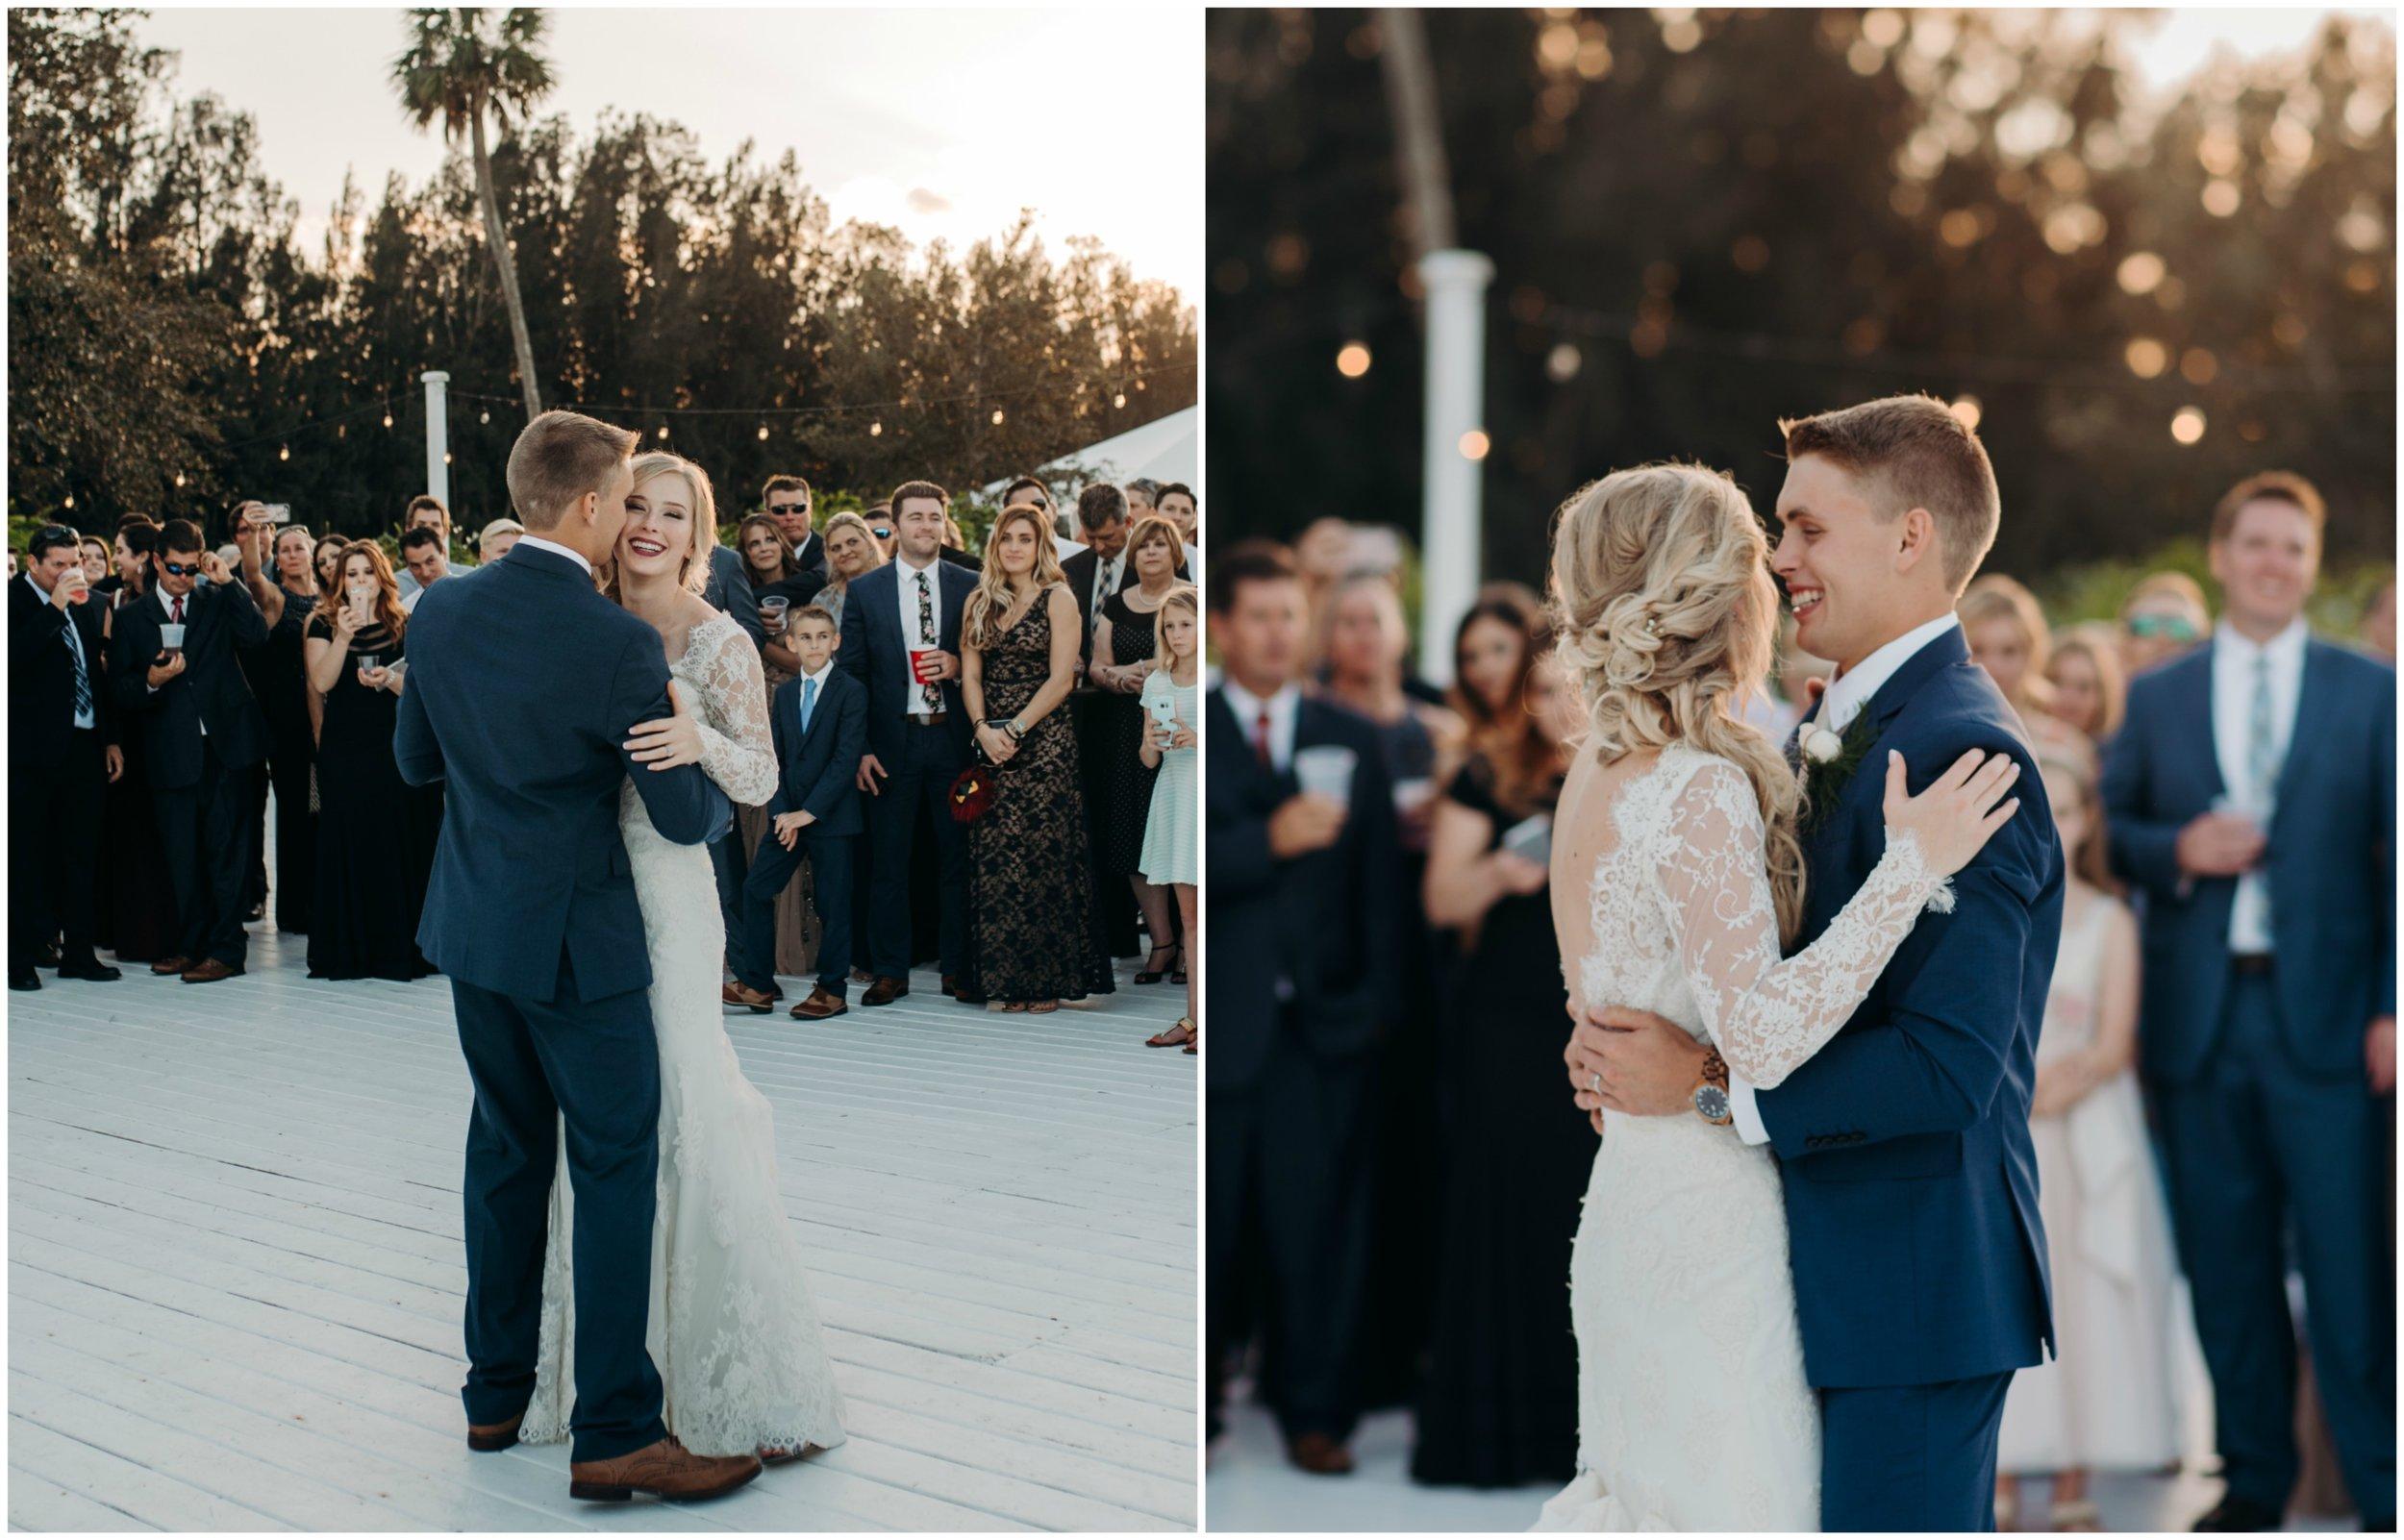 micayla-greyson-wedding-dancing-first-dance.jpg